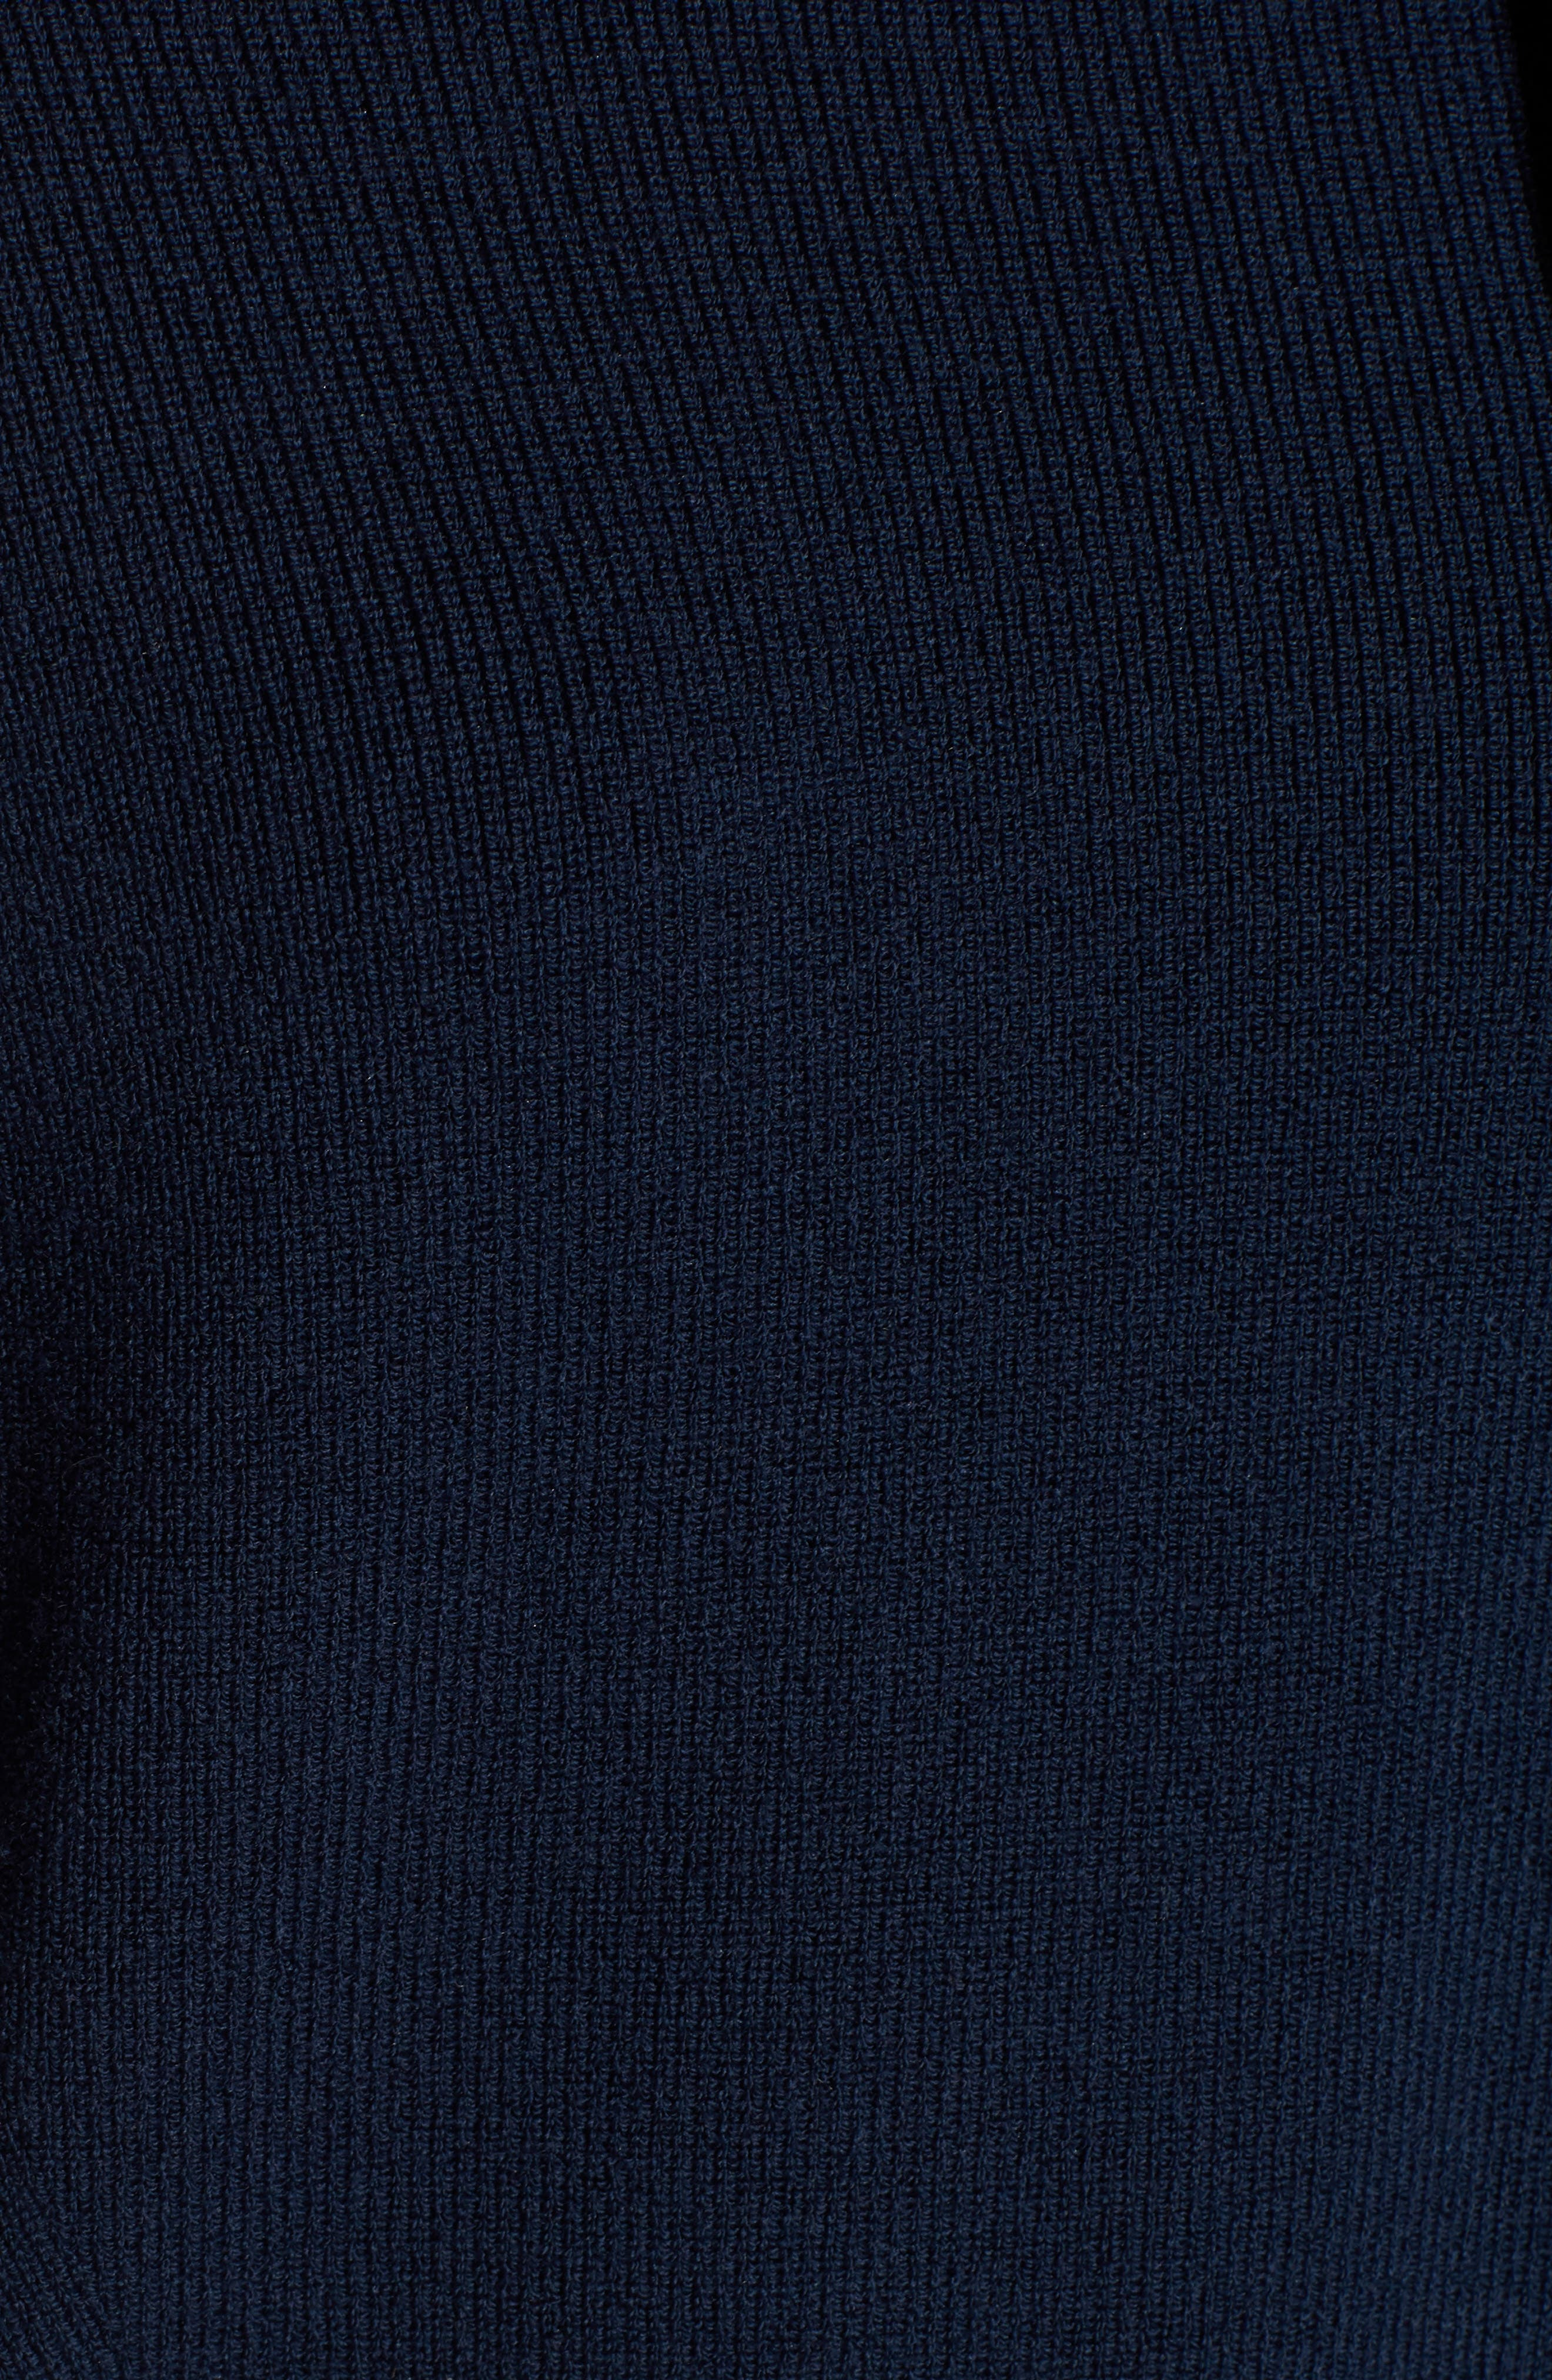 Bow Shoulder Sweater,                             Alternate thumbnail 6, color,                             410